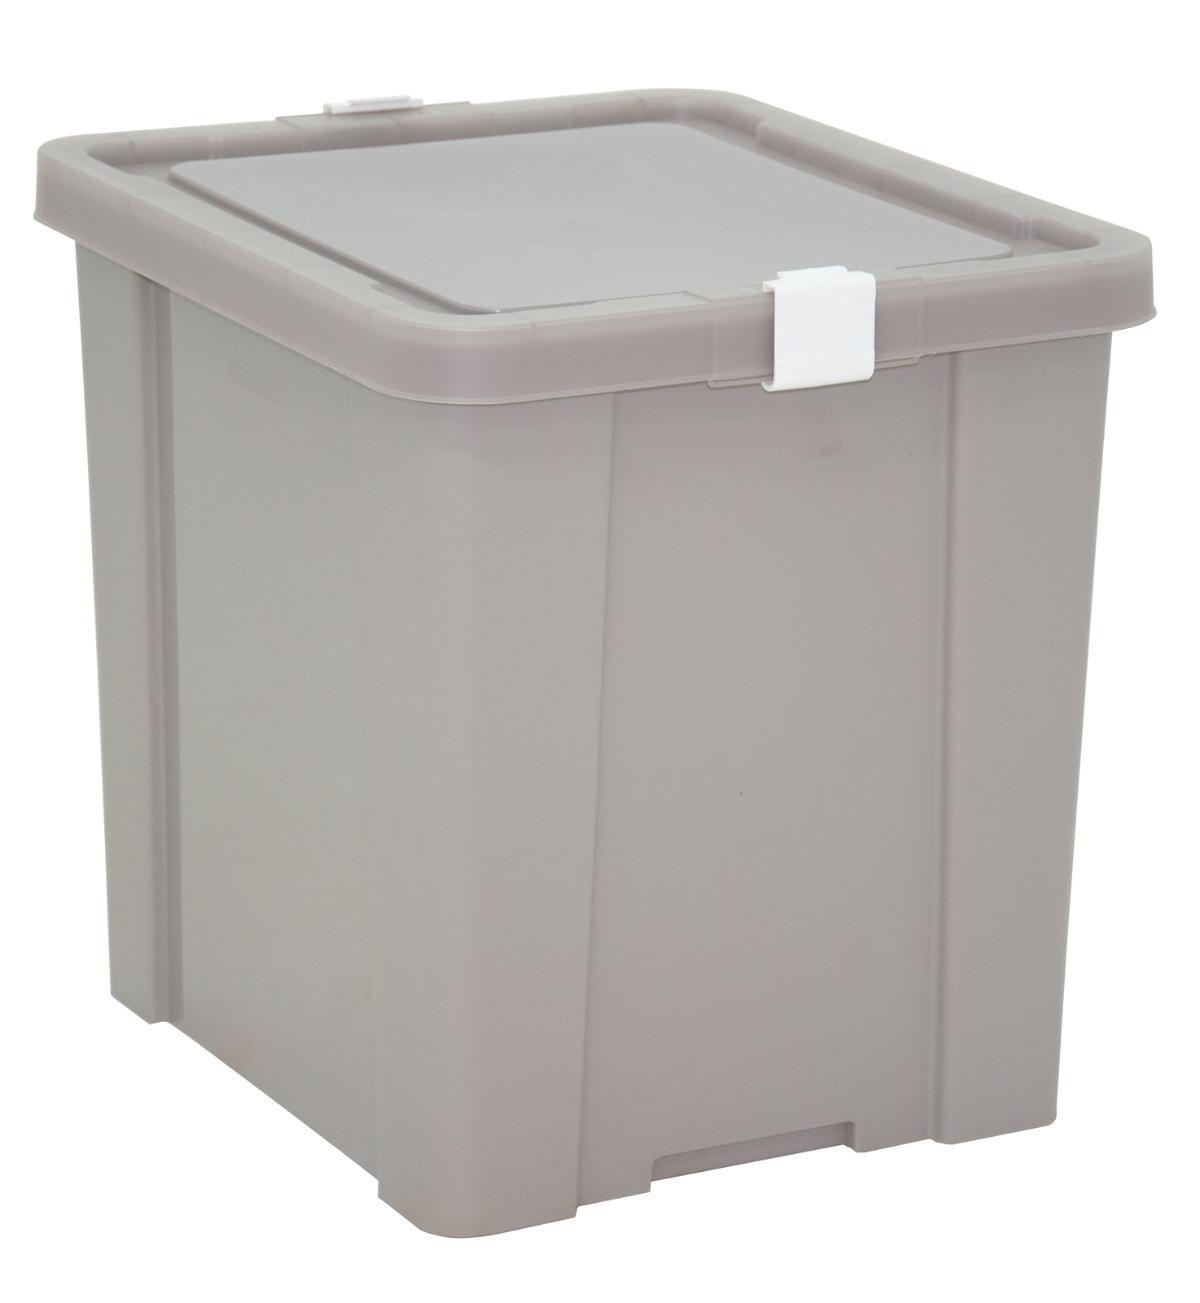 Caixa Organizadora 42L Tramontina Laundry Concreto